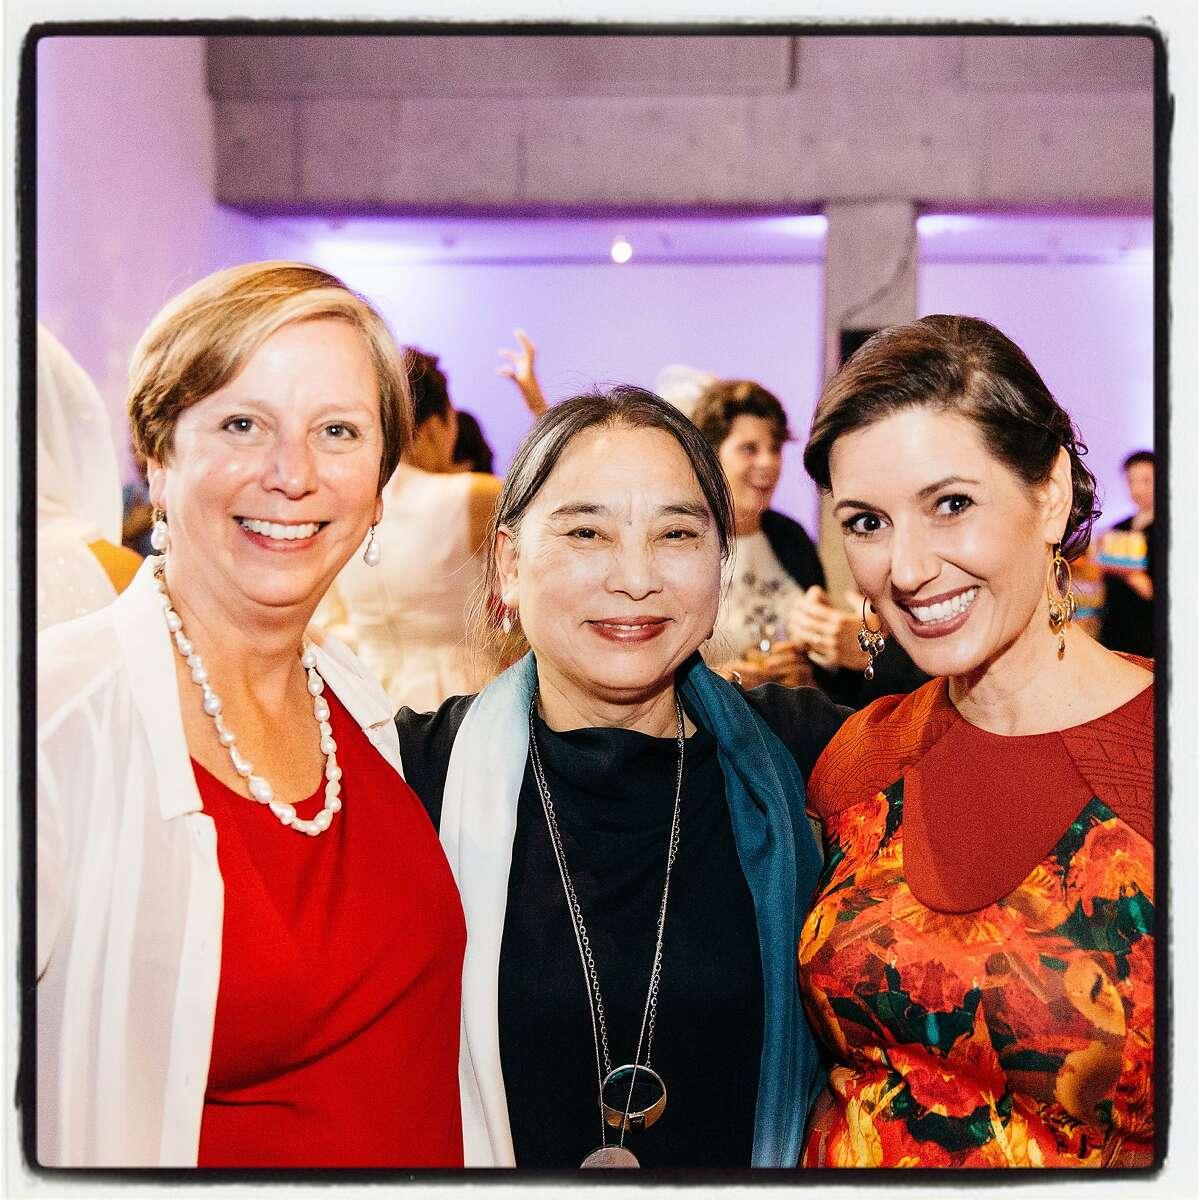 OCMA Executive Director Lori Fogarty (left) with artist Hung Liu and honorary chair, Oakland Mayor Libby Schaaf at the Ziggurat Gala. June 2016. Greg Petersen Photography